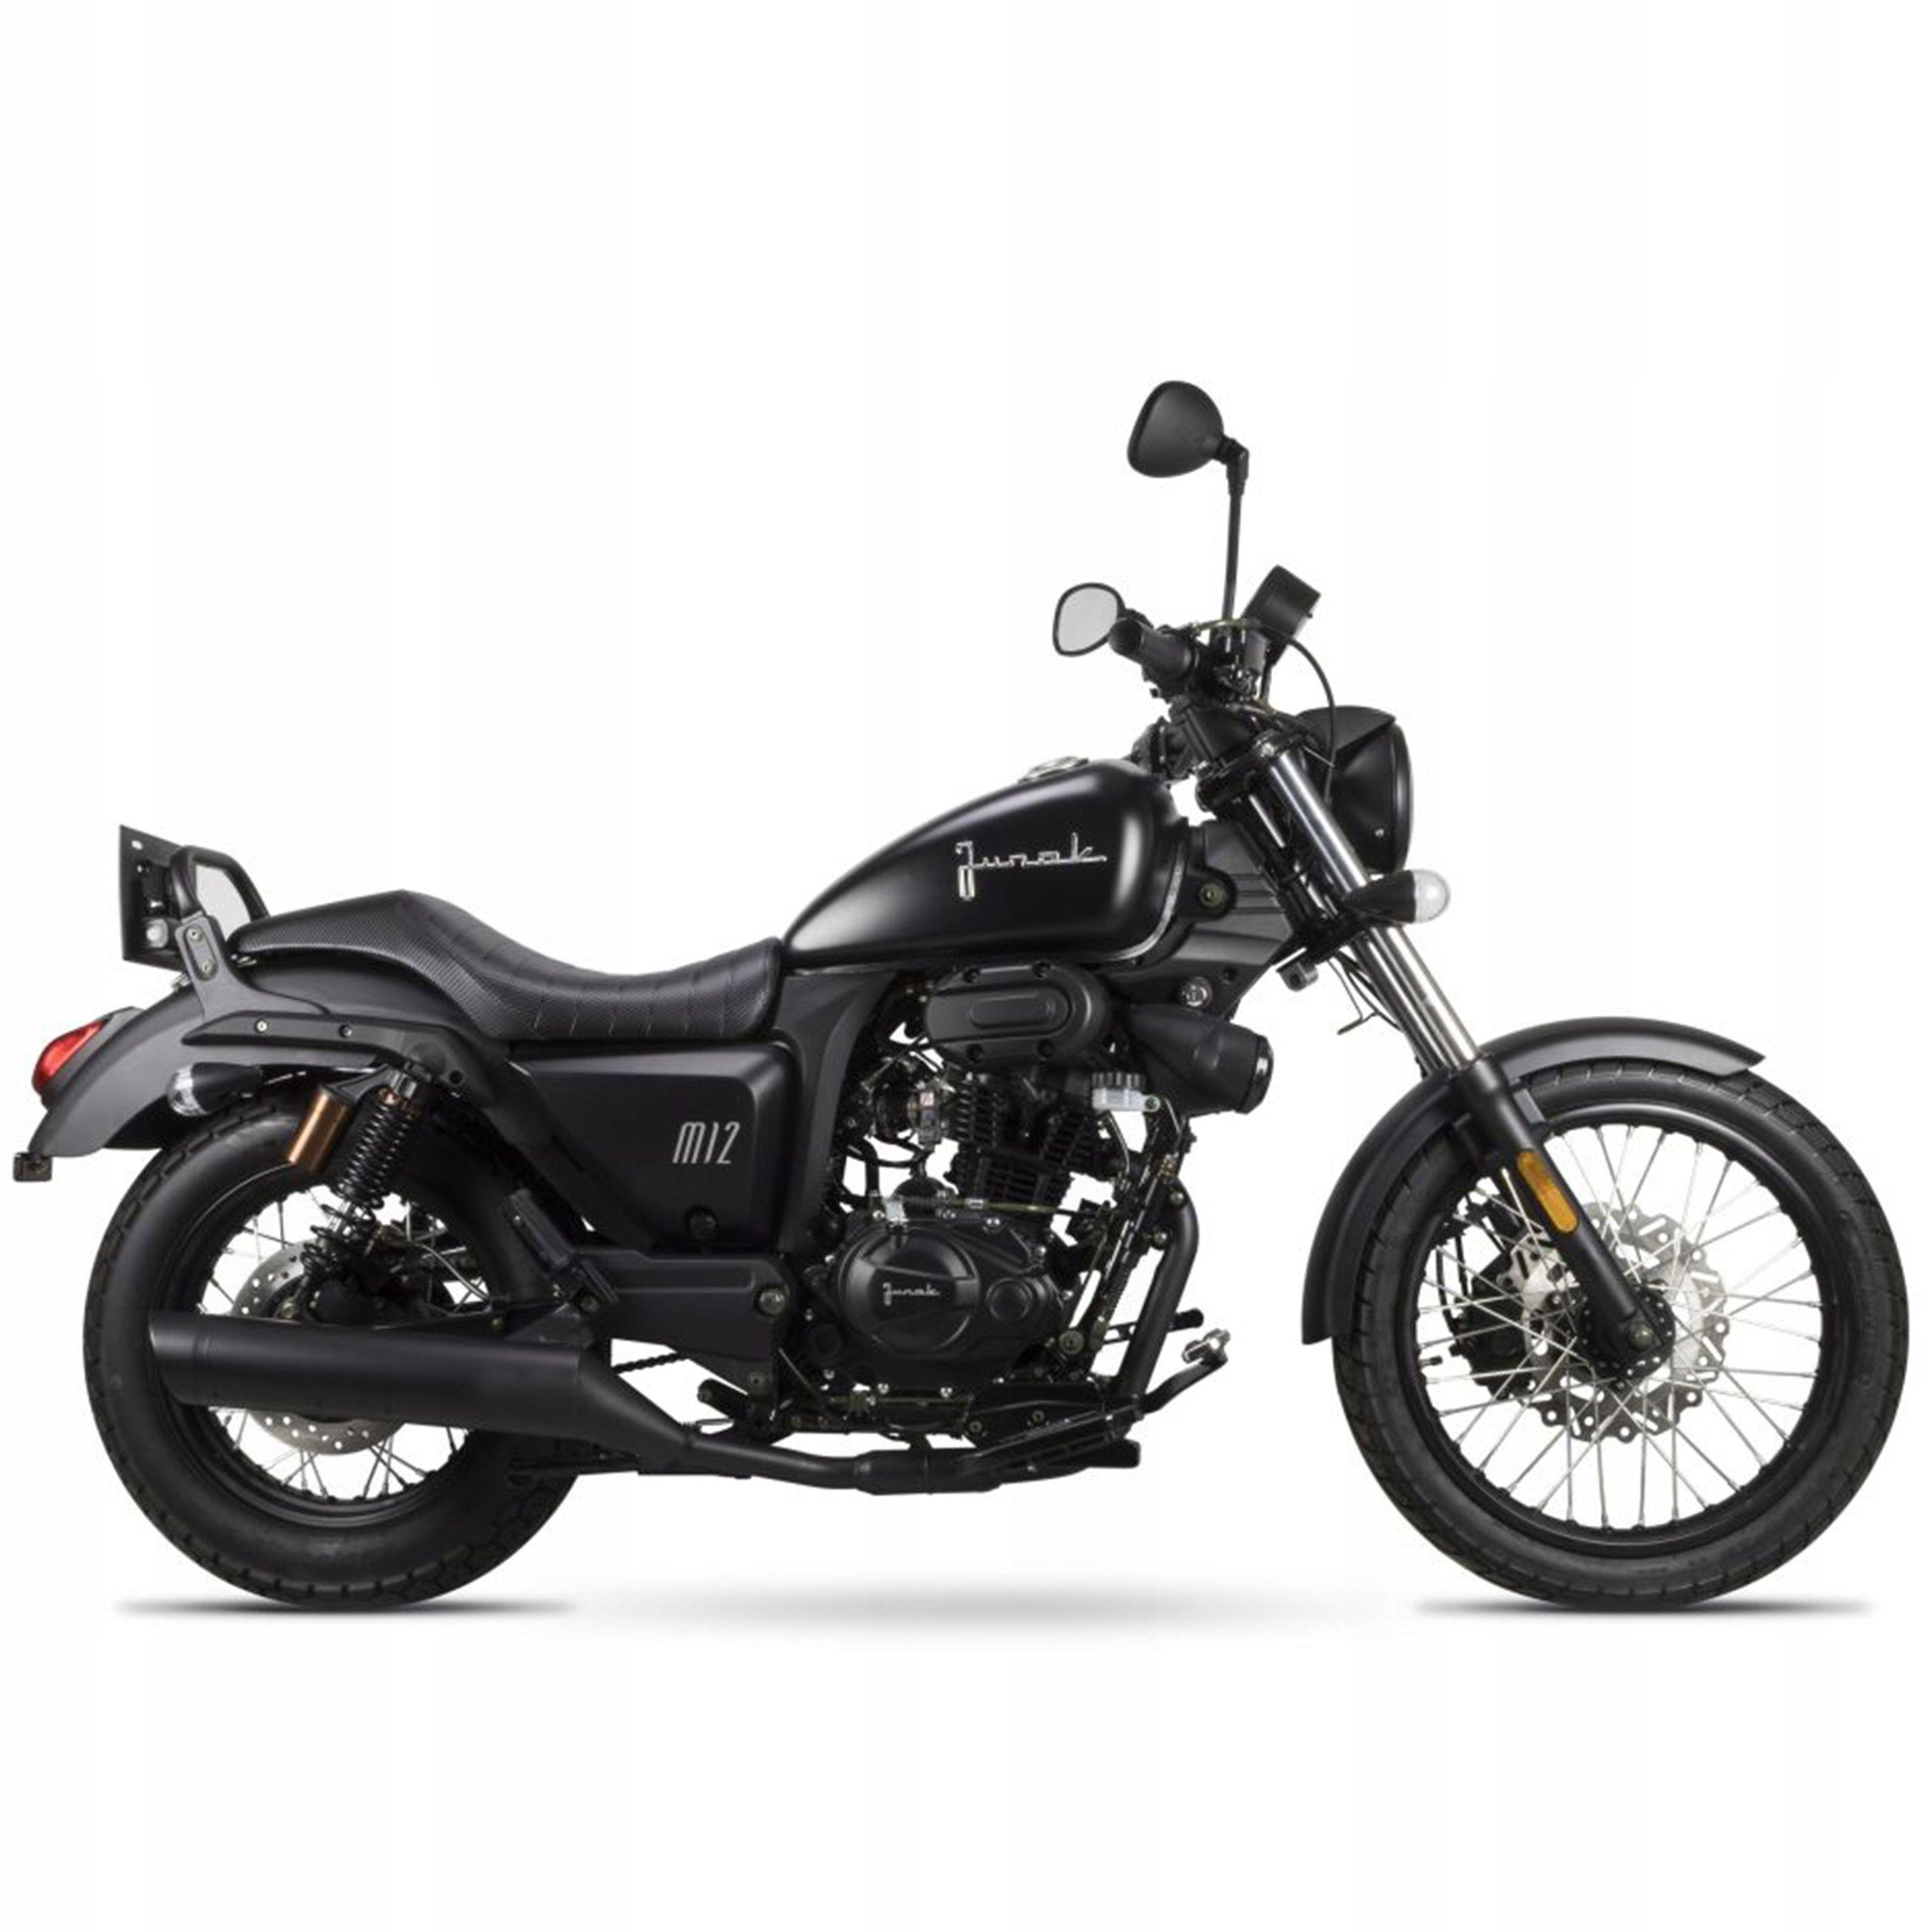 Junak M12 Vintage Pierwszy Motocykl Motorcycle Bike Vehicles